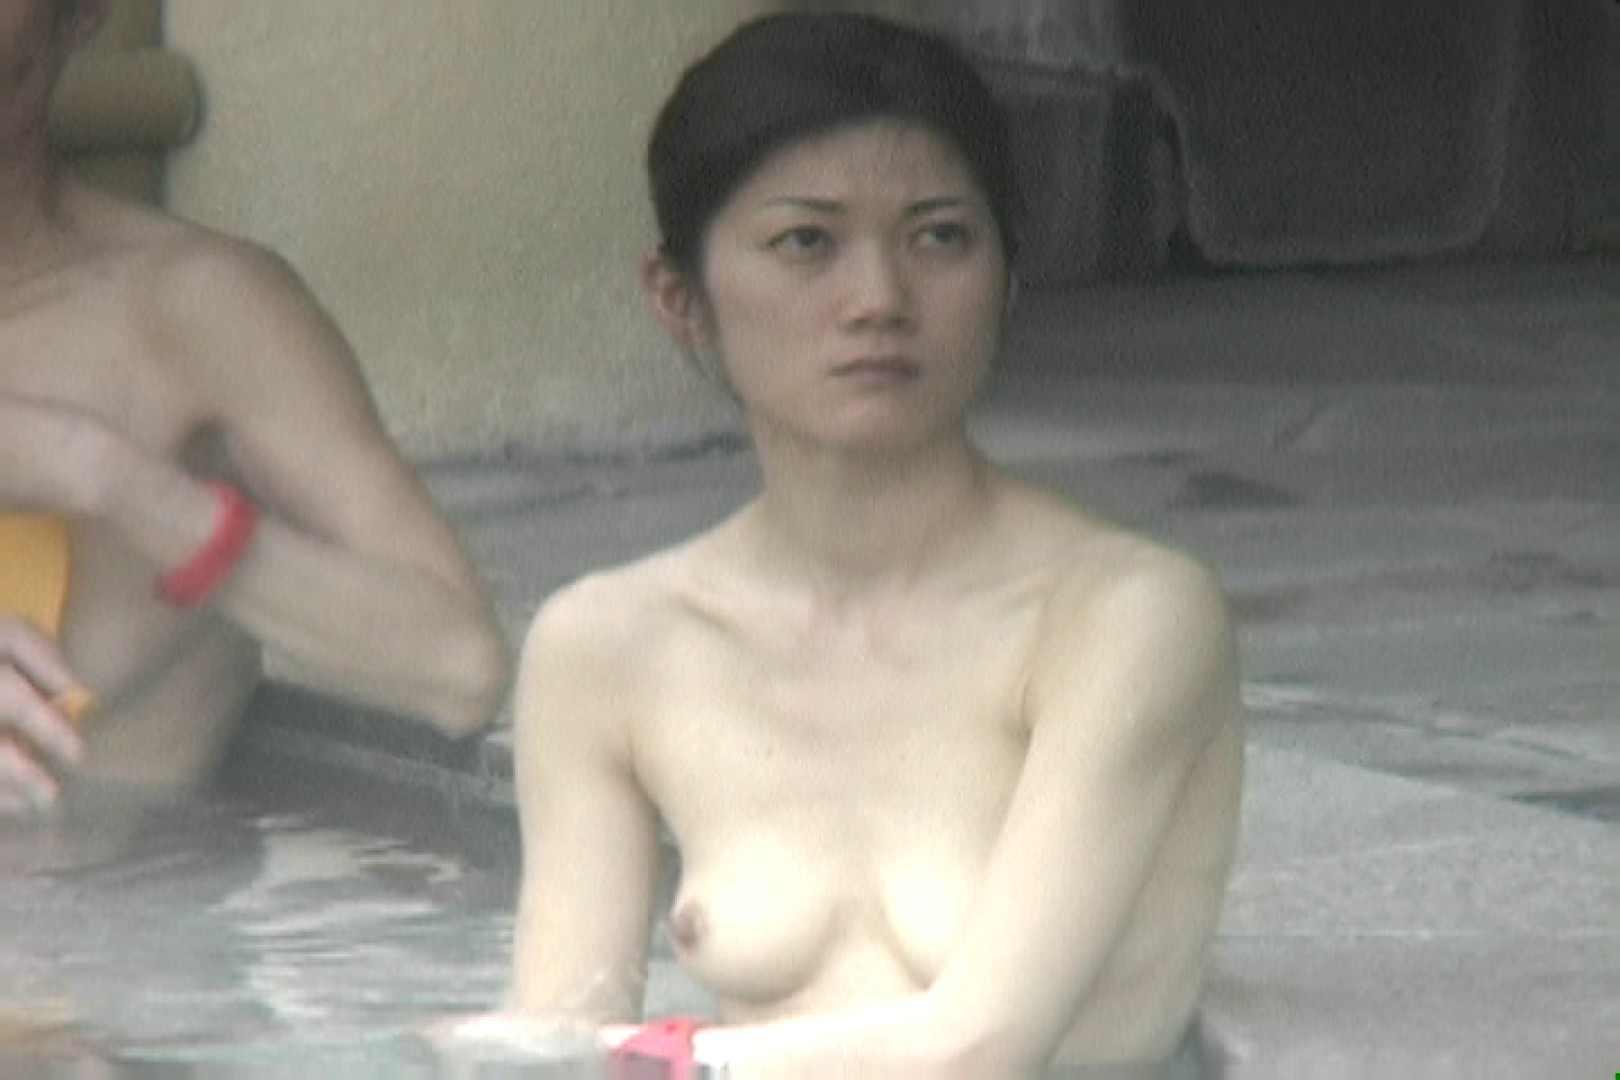 Aquaな露天風呂Vol.686 エッチな盗撮 盗み撮り動画 83pic 58